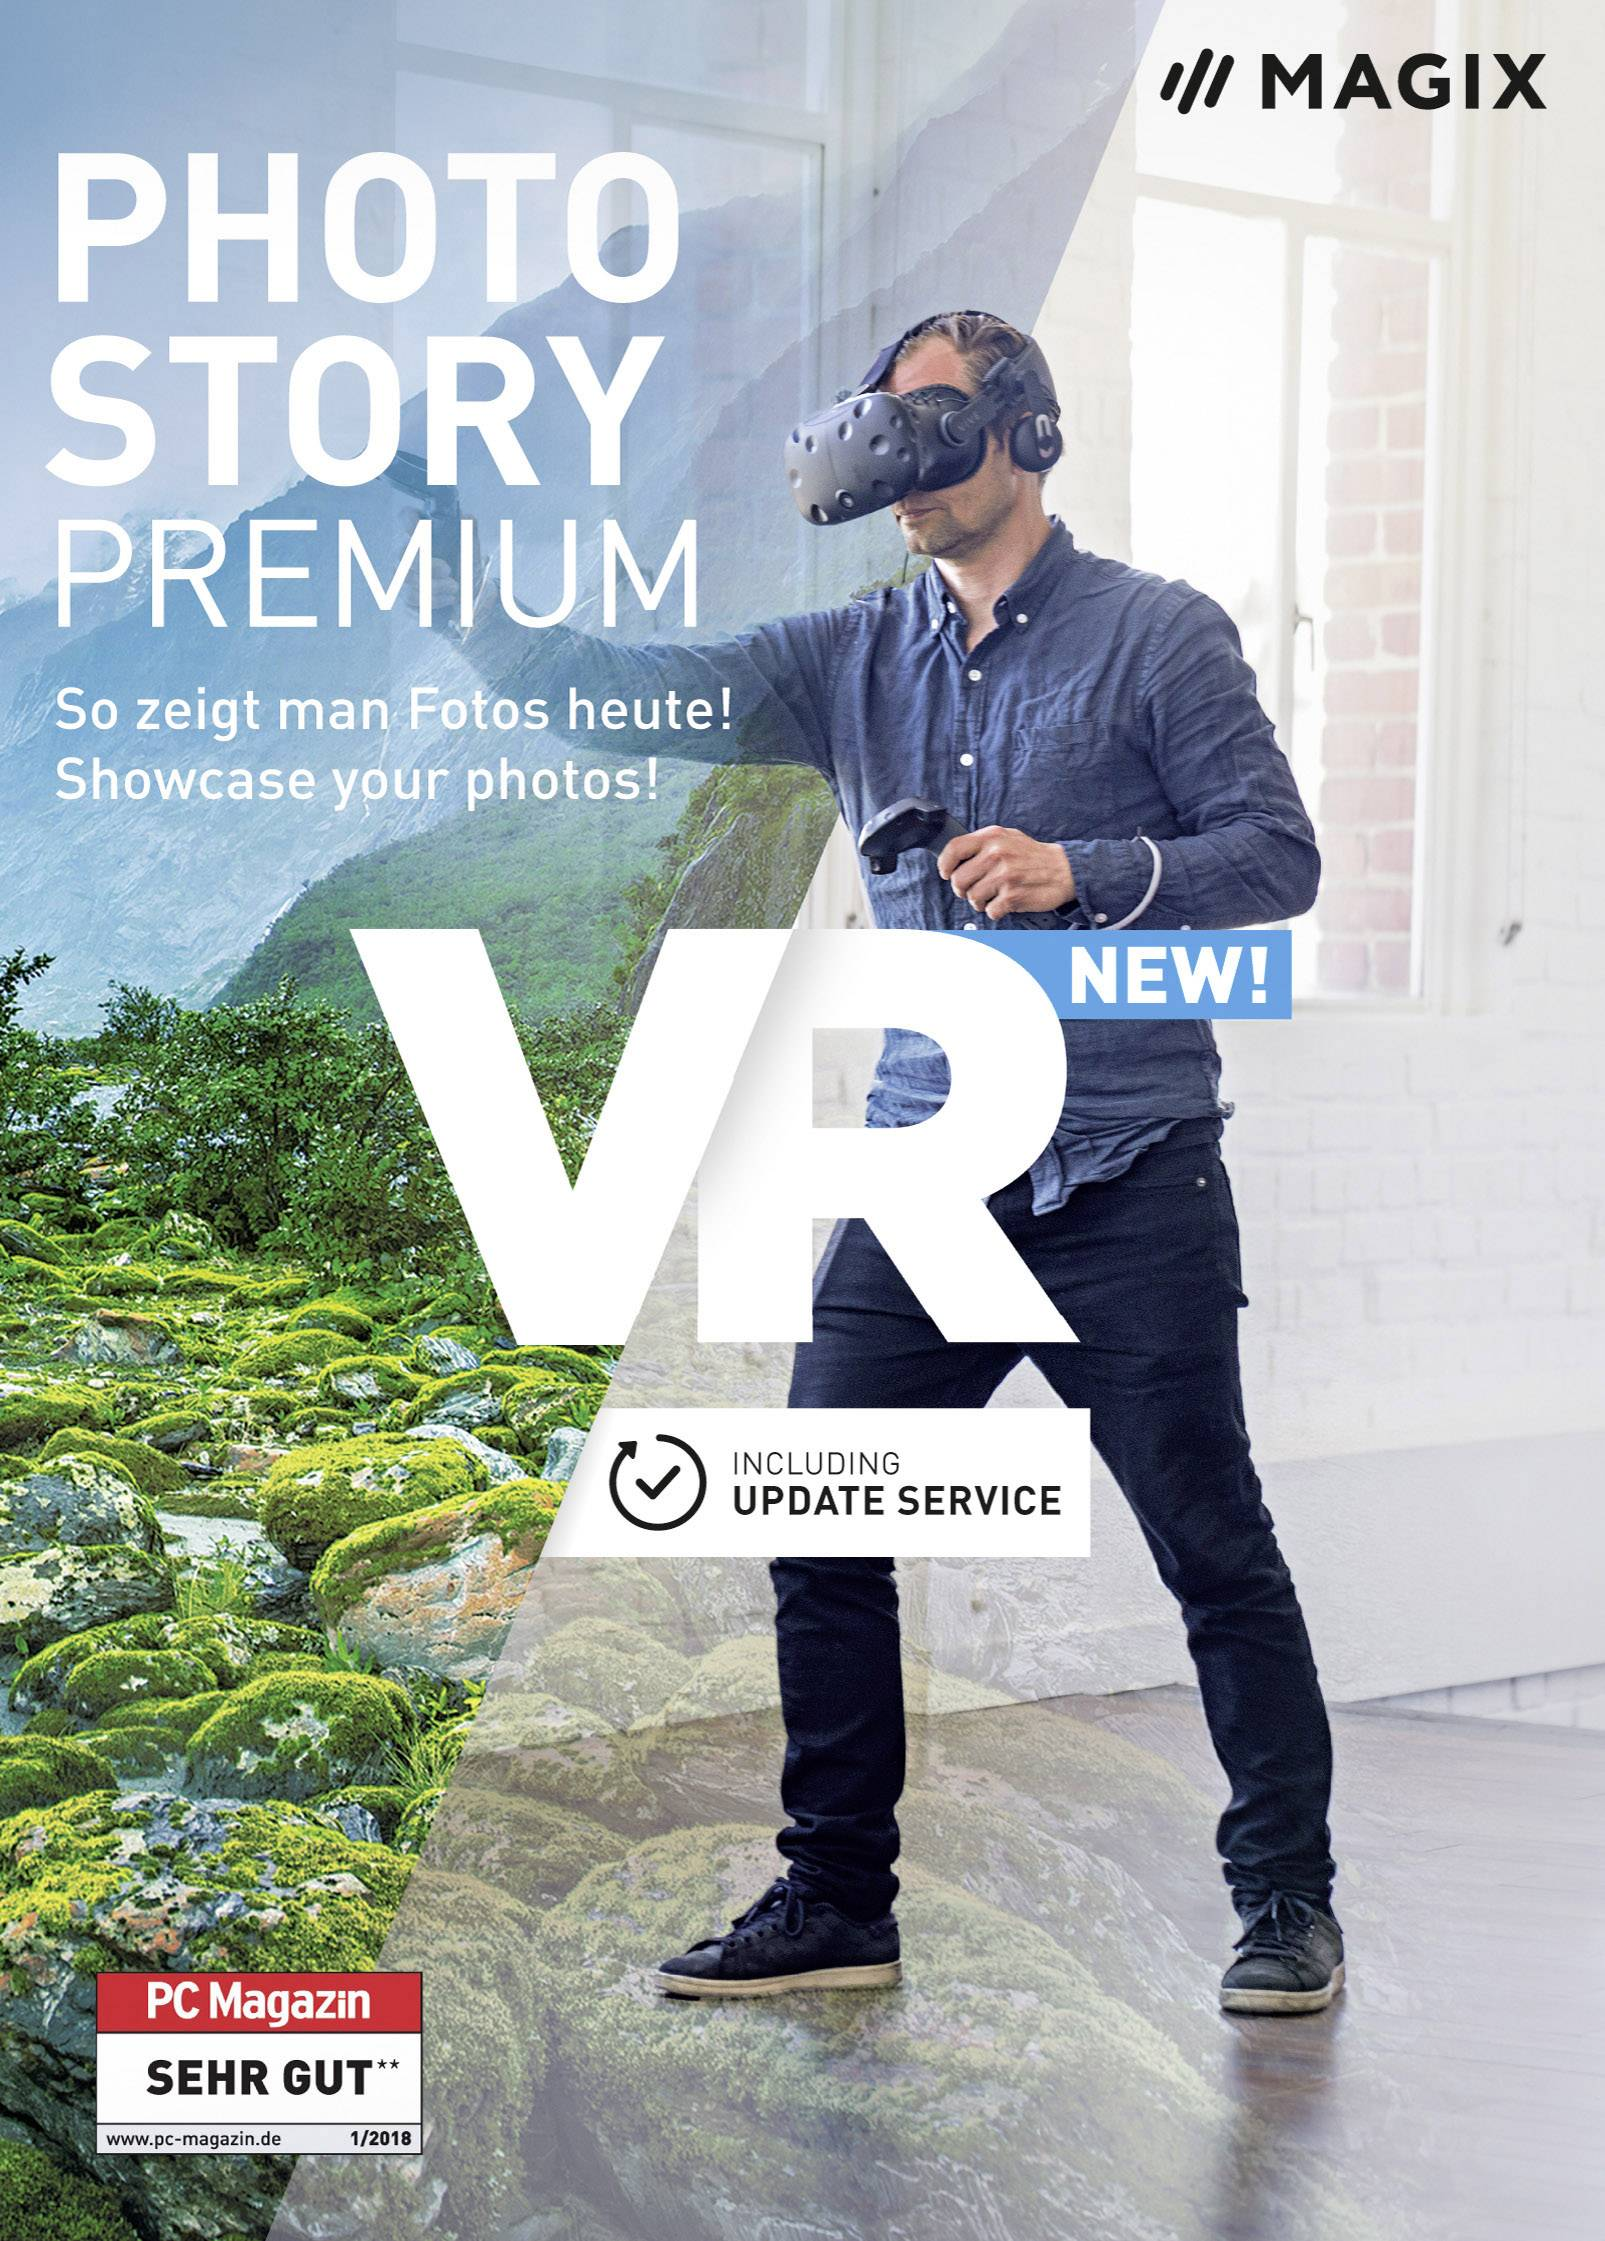 Magix Photostory Premium VR Full version, 1 license Windows